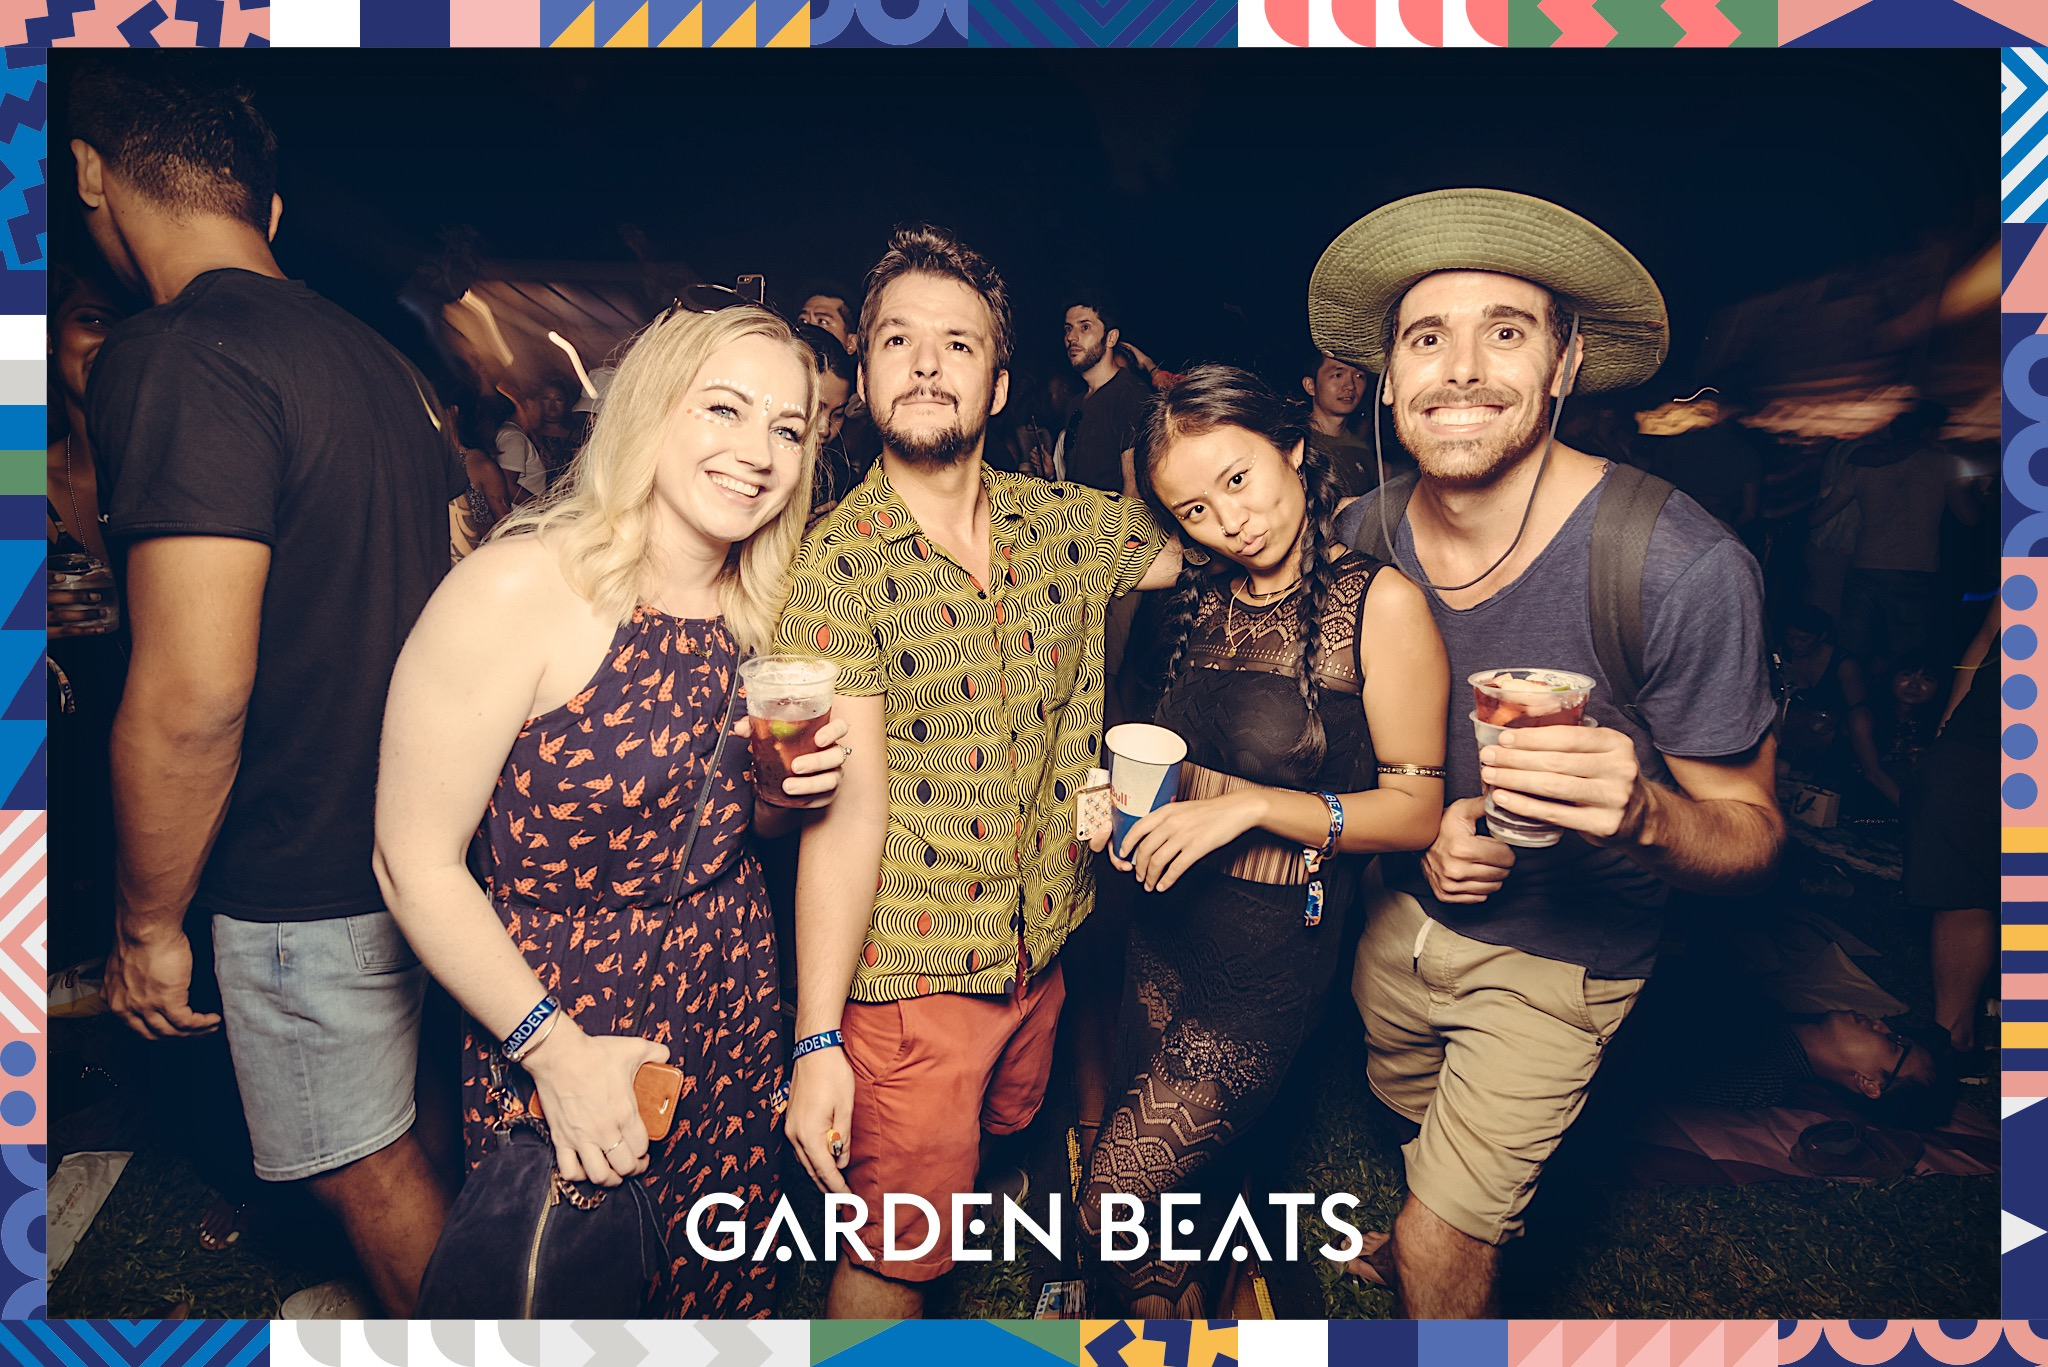 18032017_GardenBeats_Colossal732_WatermarkedGB.jpg